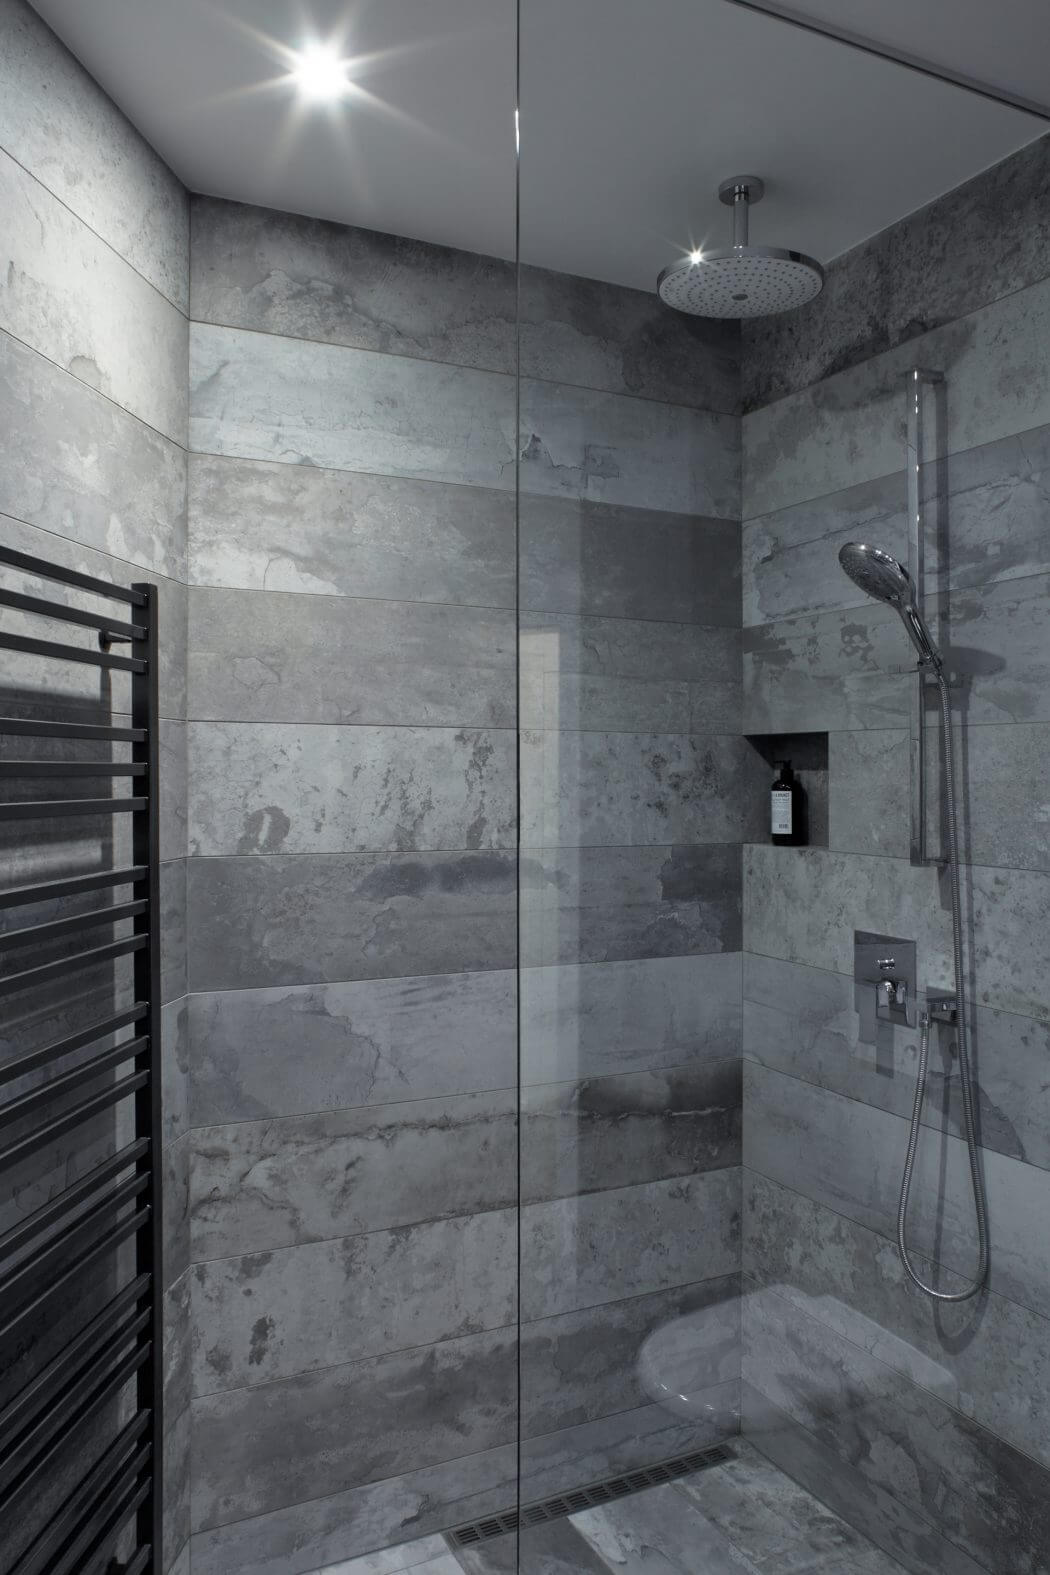 025-loft-f504-smlxl-studio-1050x1575